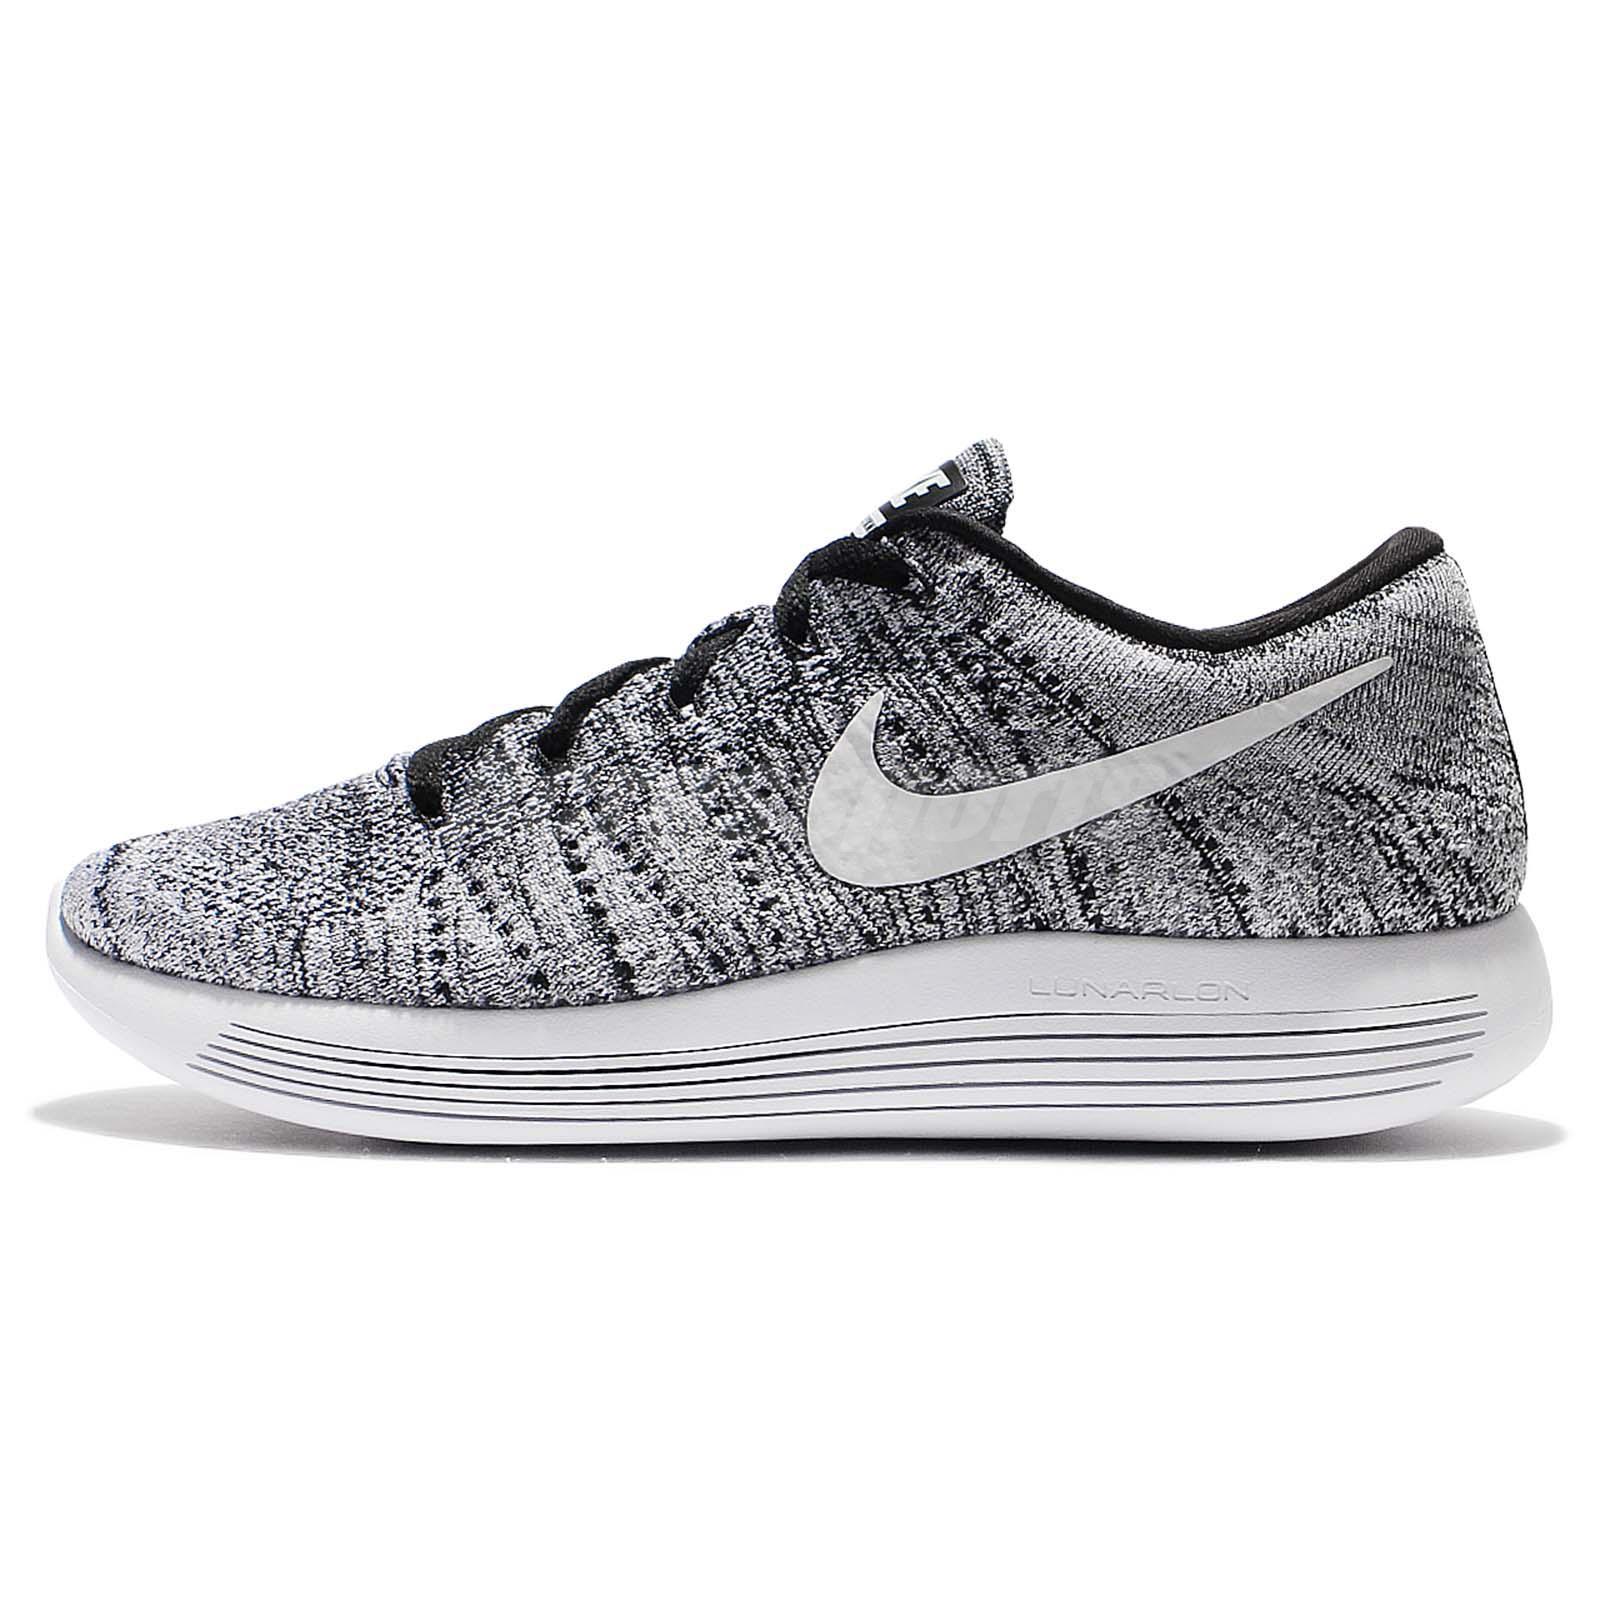 541399f95a6a C Nike Lunarepic Low Flyknit Oreo Black White Men Running Shoe Sneakers  843764-001 ...